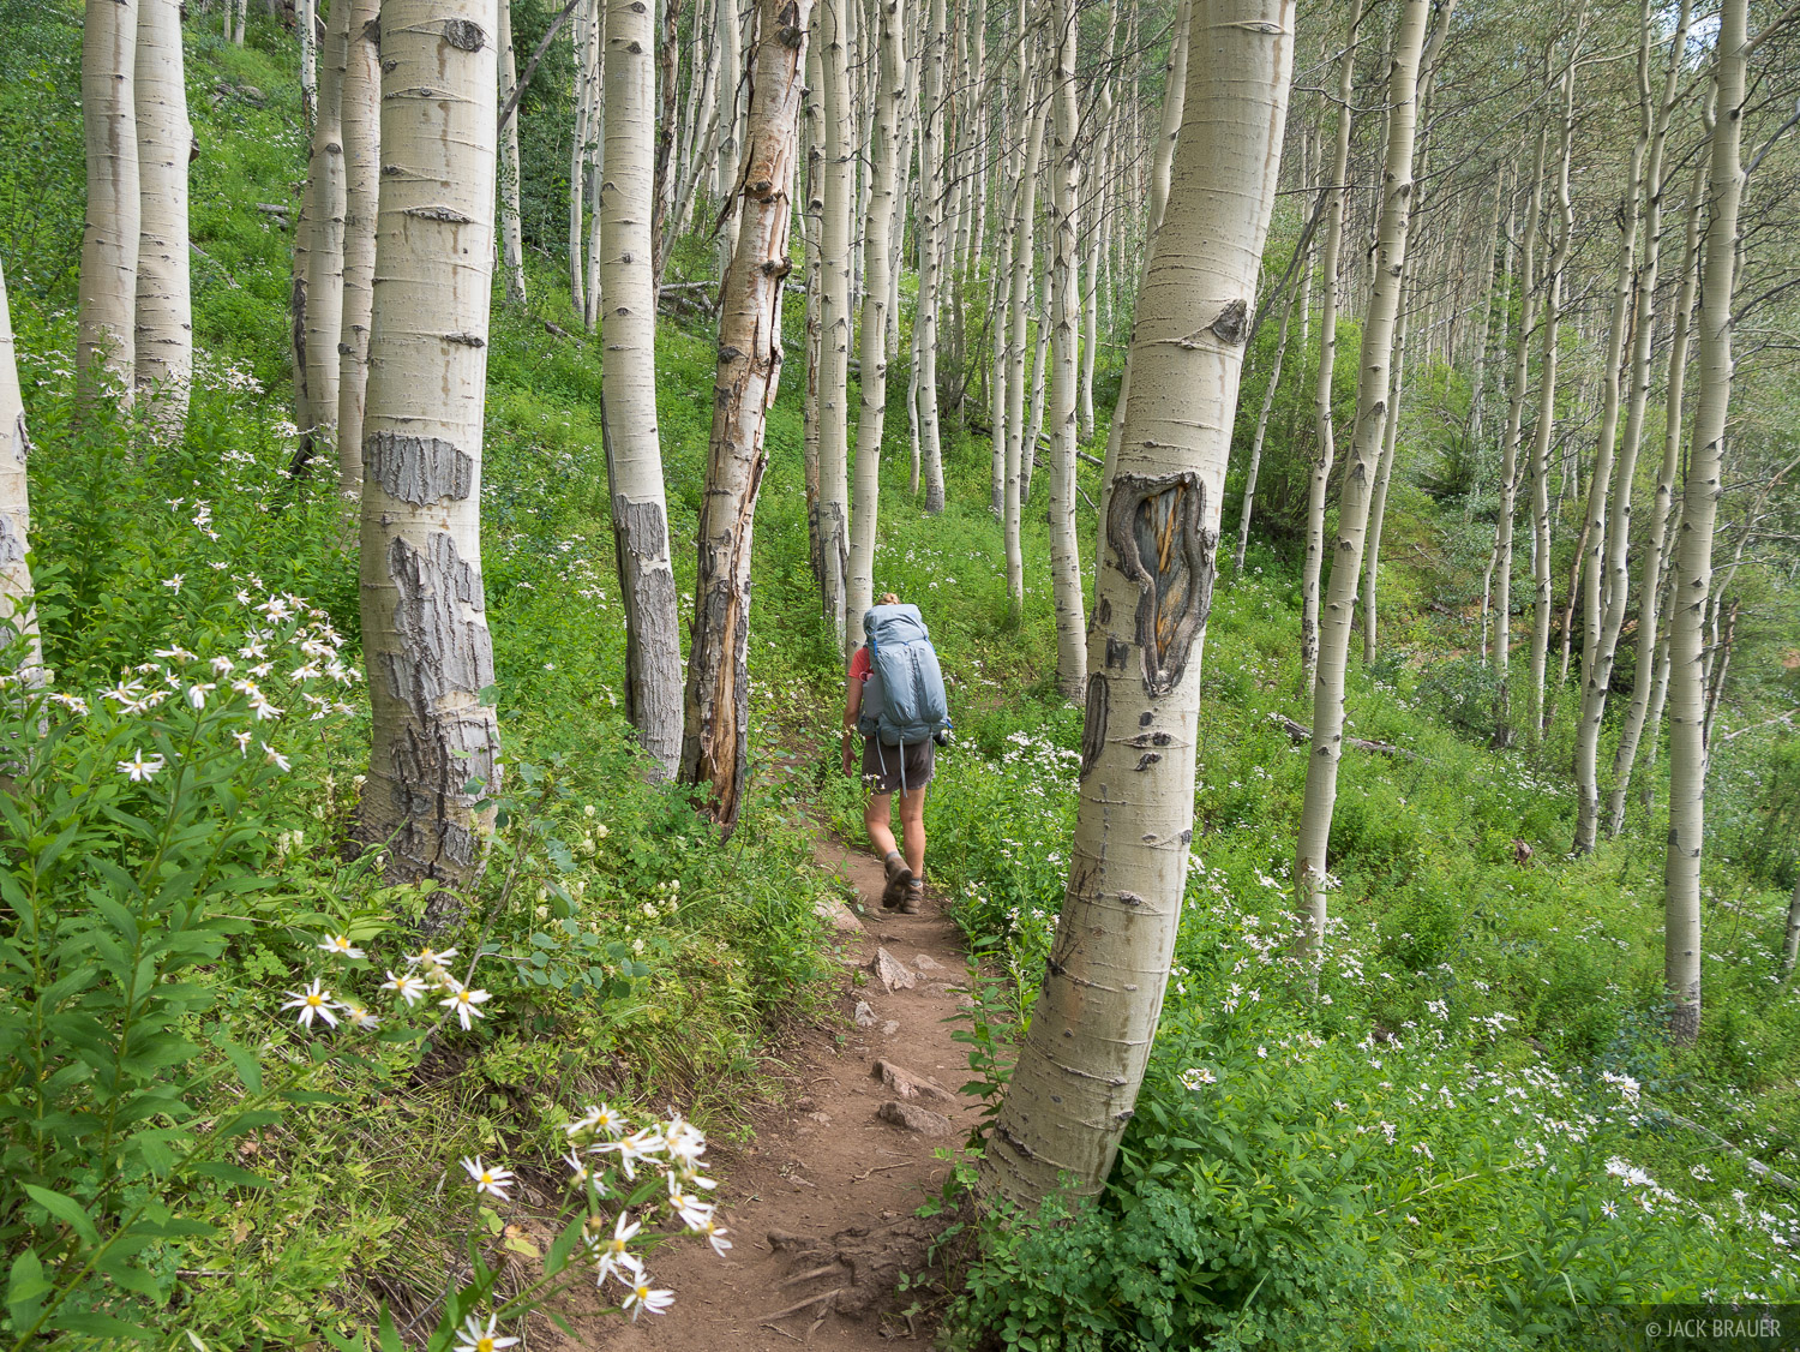 Colorado, Gore Range, aspens, Eagles Nest Wilderness, trail, photo